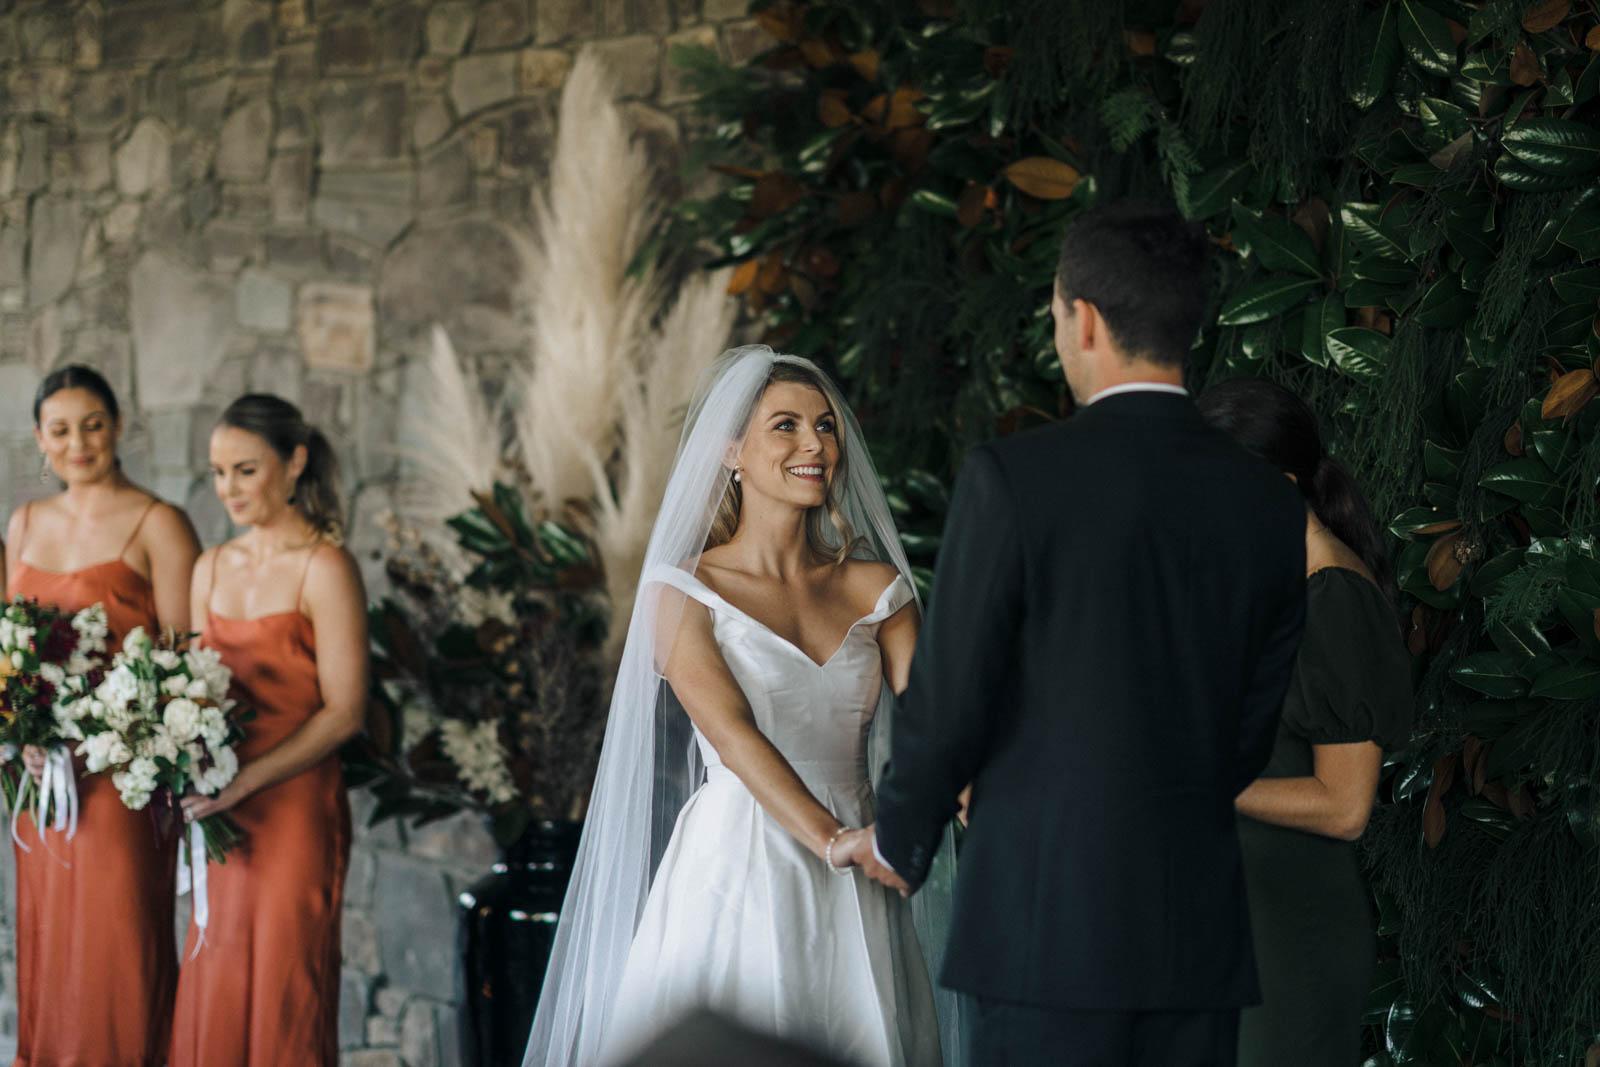 newfound-s-p-mt-maunganui-tauranga-wedding-photographer-1658-A9_06171